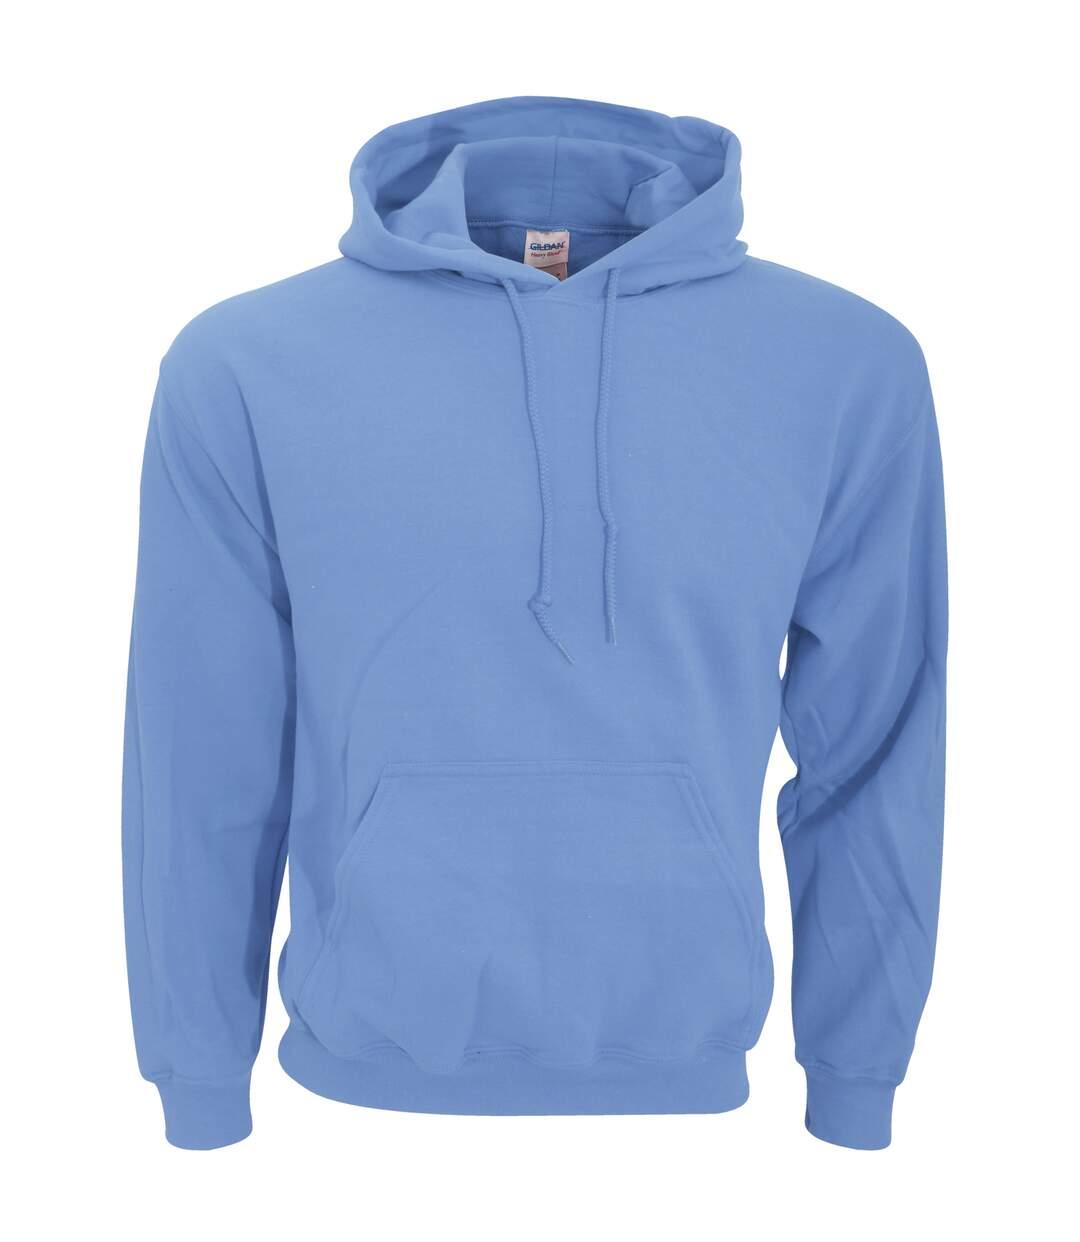 Gildan Heavy Blend Adult Unisex Hooded Sweatshirt / Hoodie (Azalea) - UTBC468